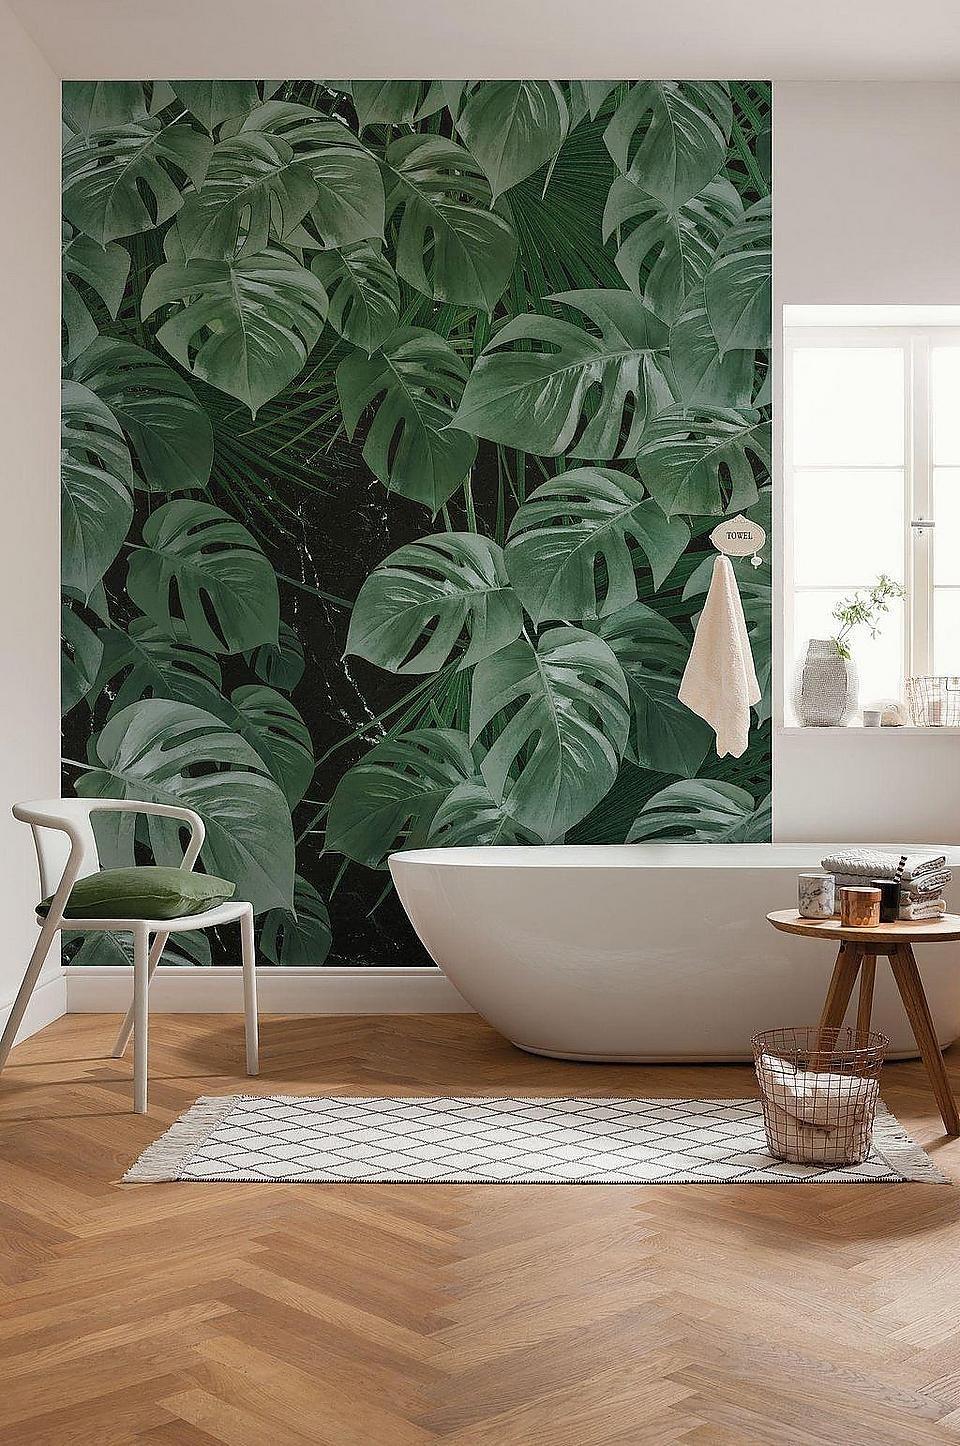 Komar Vlies Fototapete Monstera On Marble Badezimmer Bad Einrichten Einrichtungsideen Tapeten Wandbilder Komar Tapeten Badezimmer Tapete